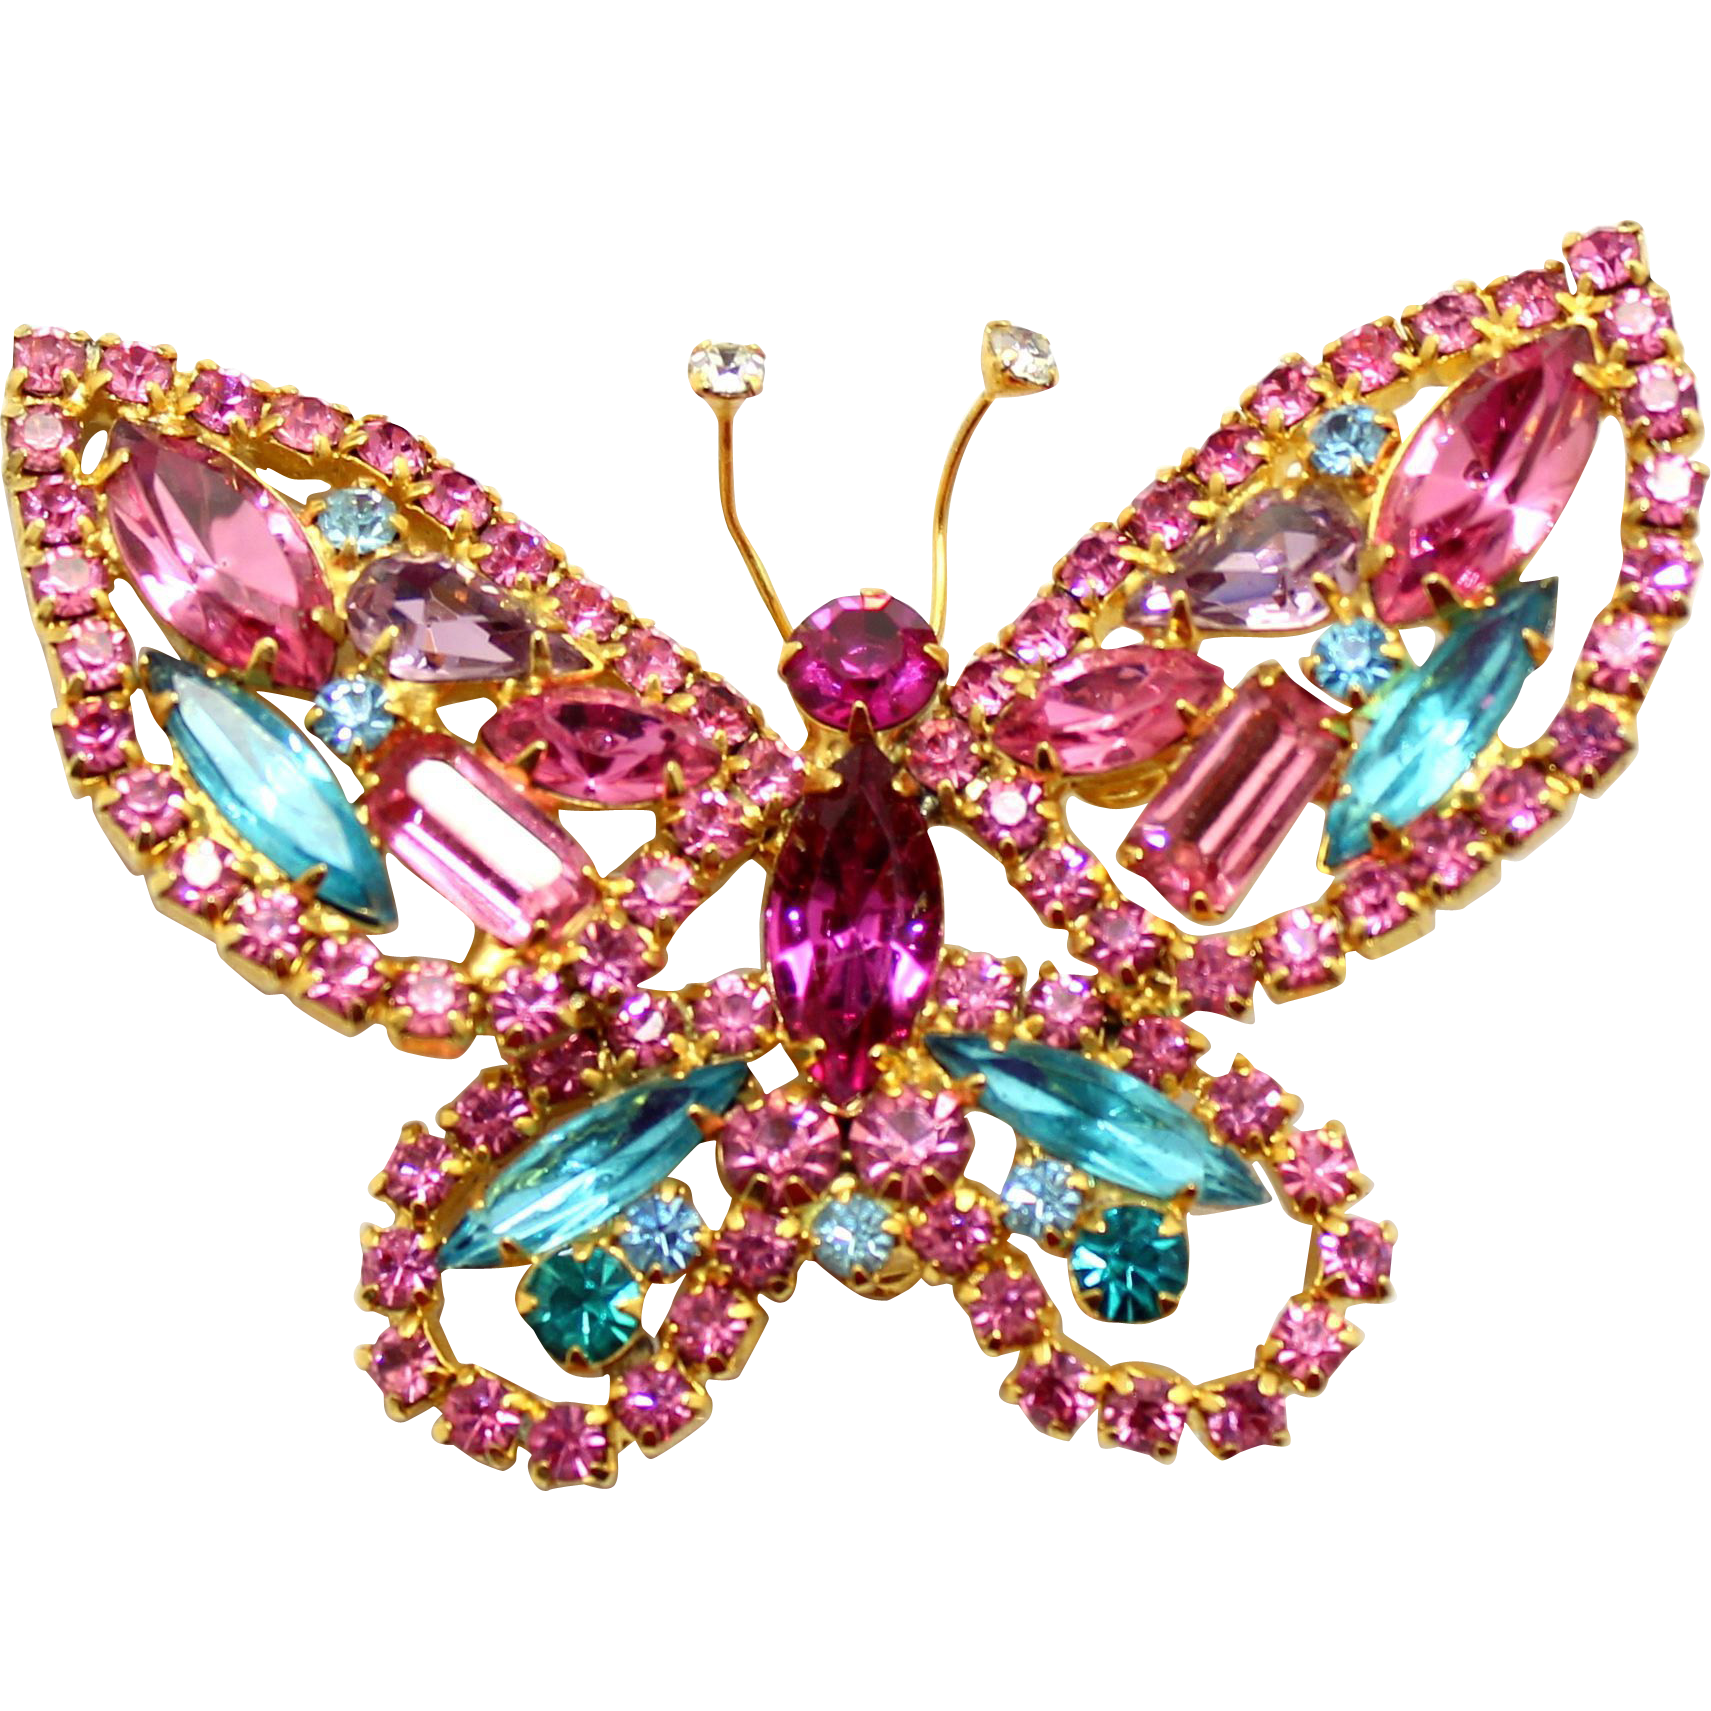 Vintage Juliana (D&E) Book Piece Pink, Fuchsia & Aqua blue Rhinestone Figural Butterfly Brooch